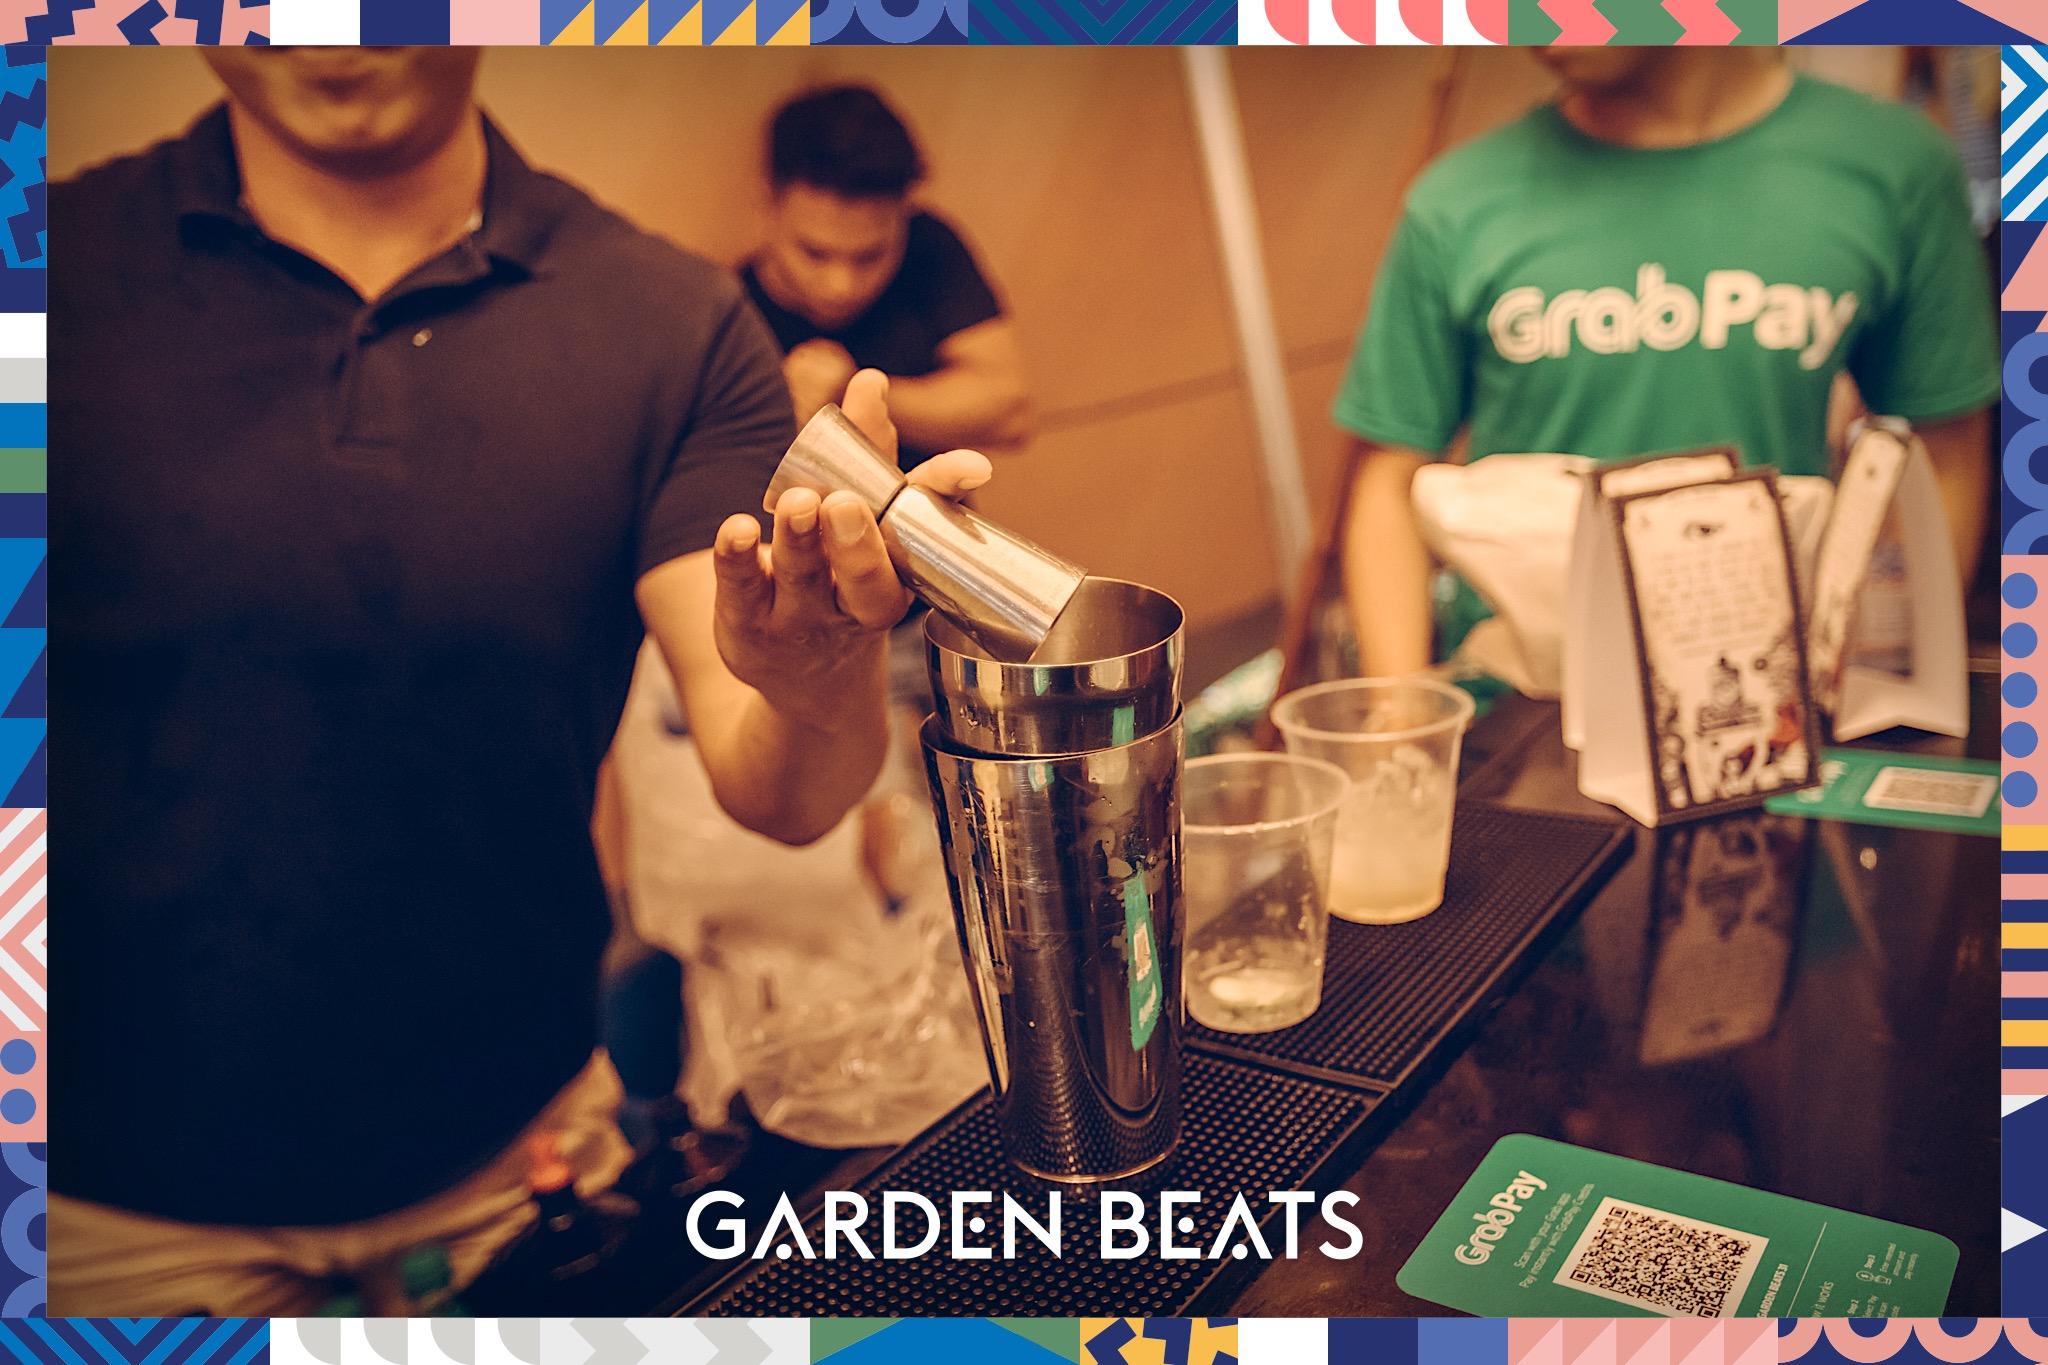 03032018_GardenBeats_Colossal368_Watermarked.jpg